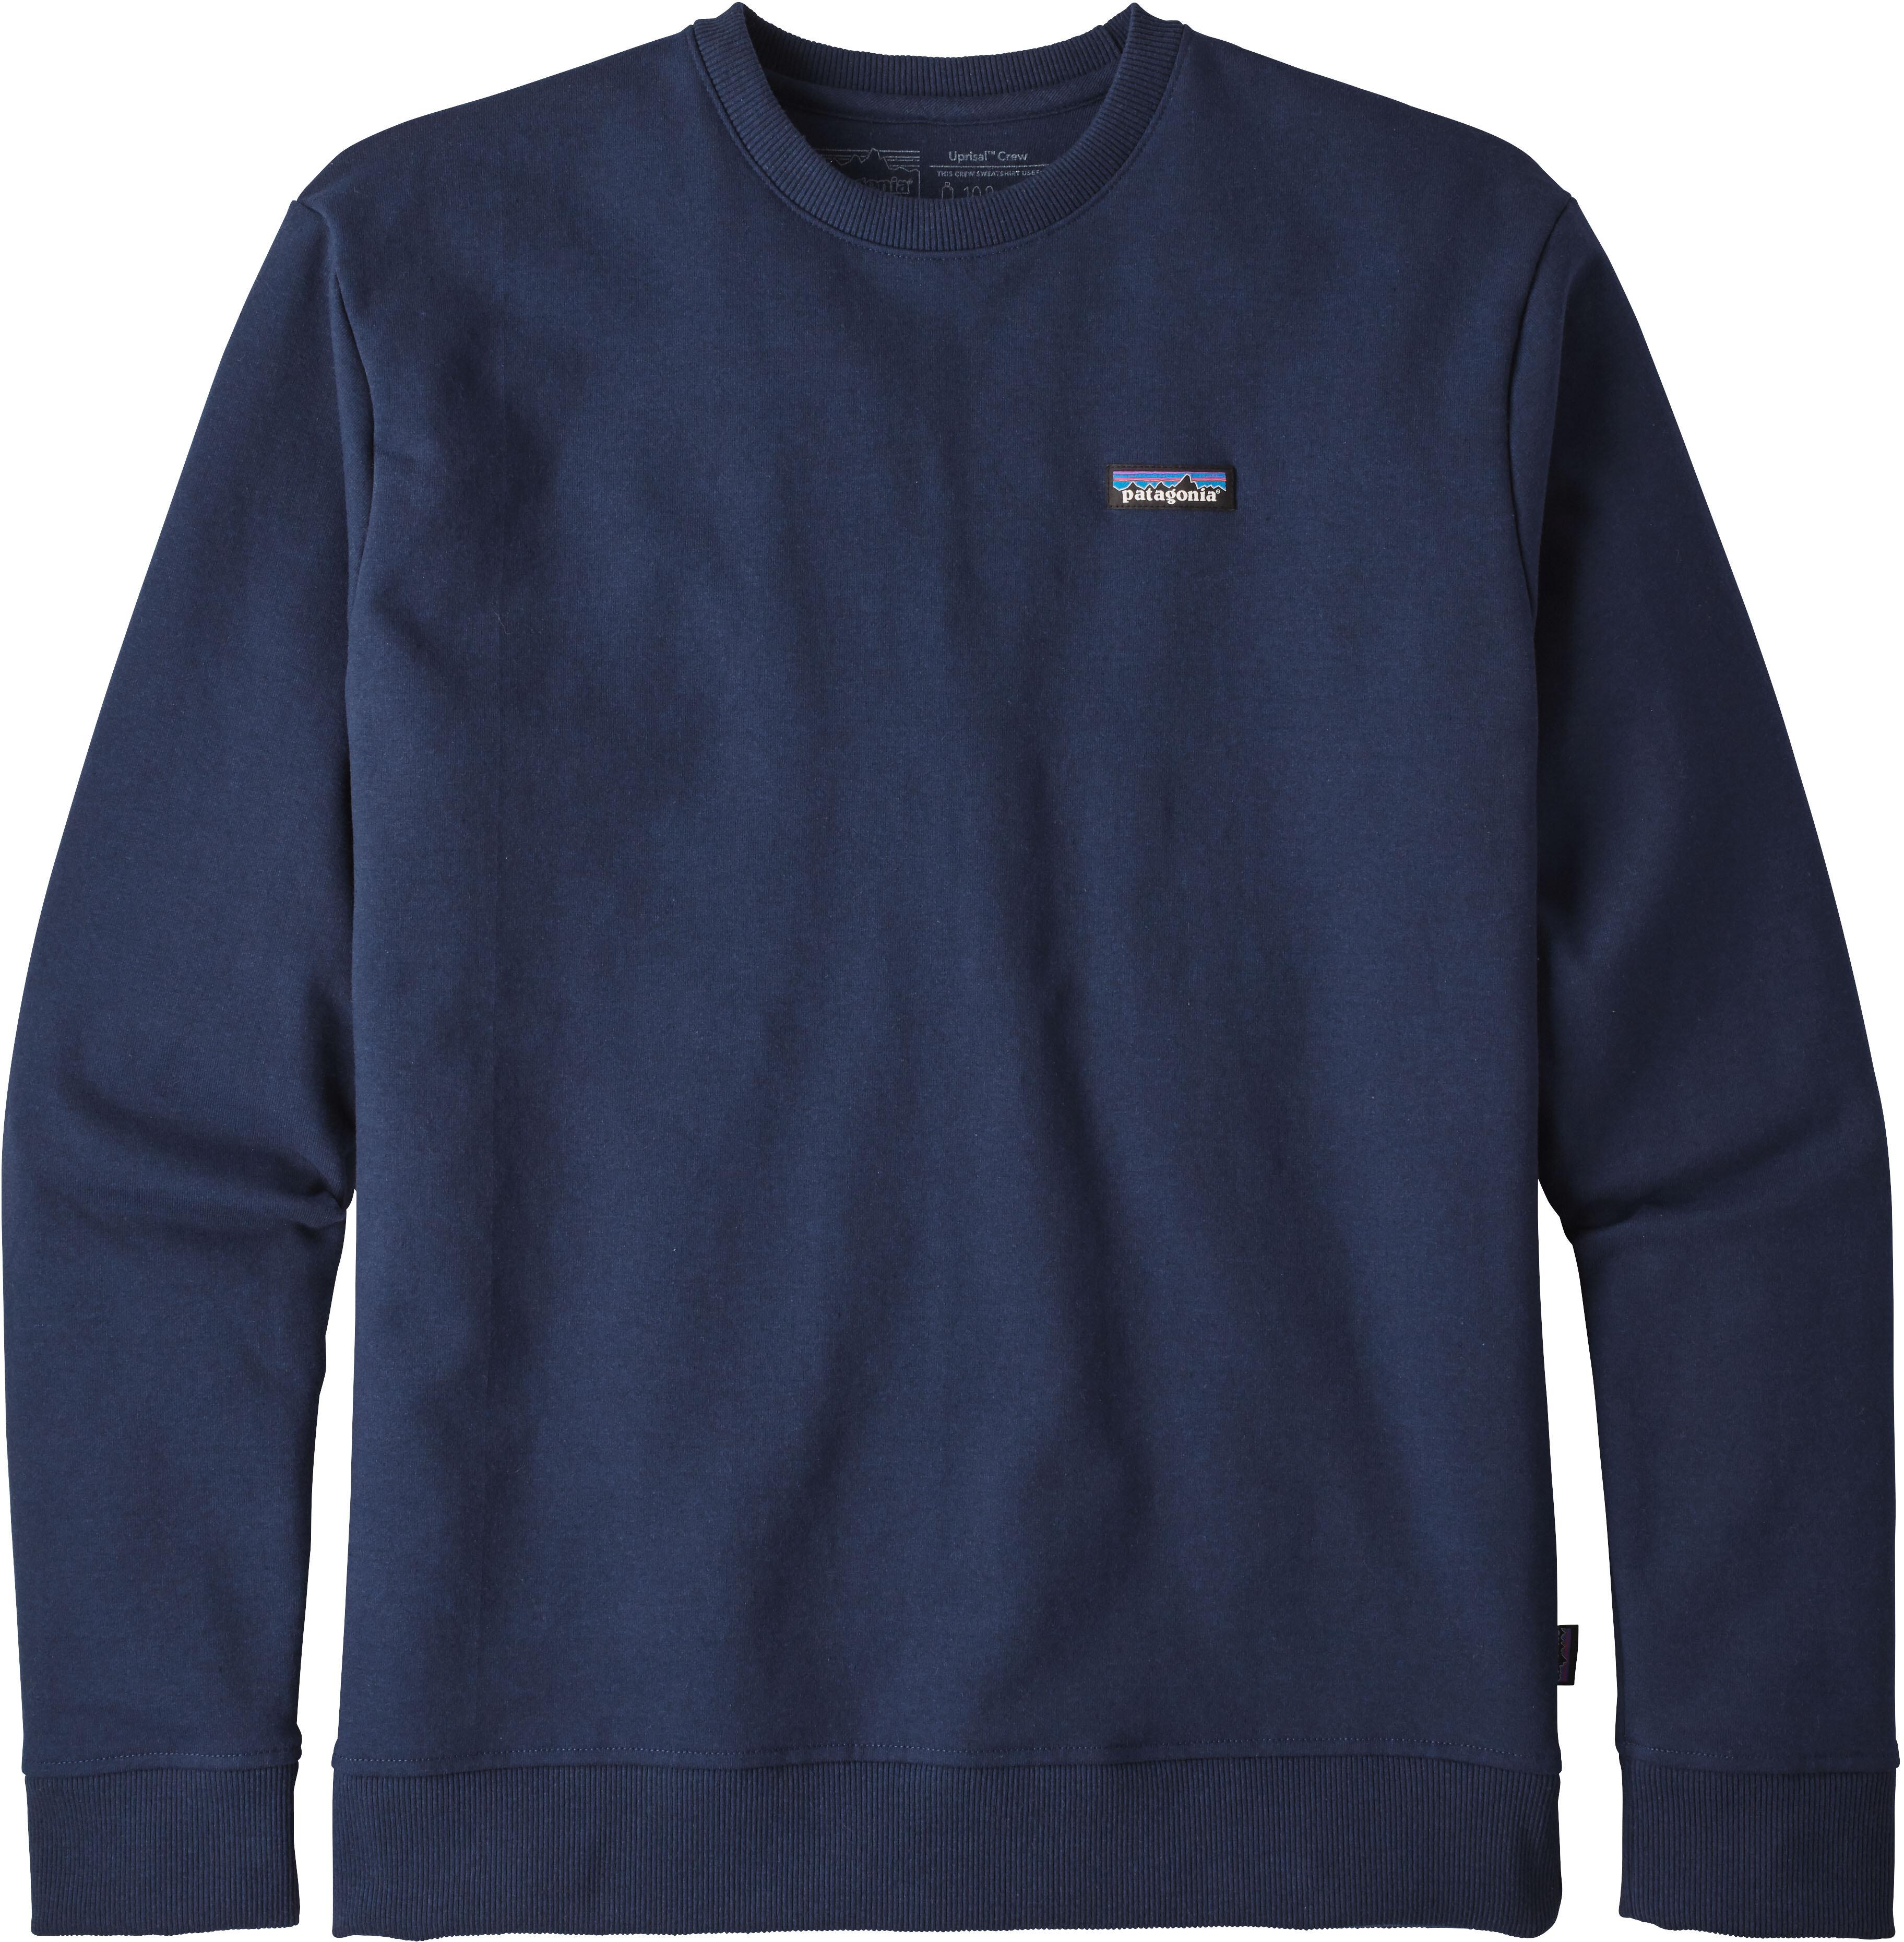 Patagonia M s P-6 Label Uprisal Crew Sweatshirt Classic Navy ... c241fd00cfcb9